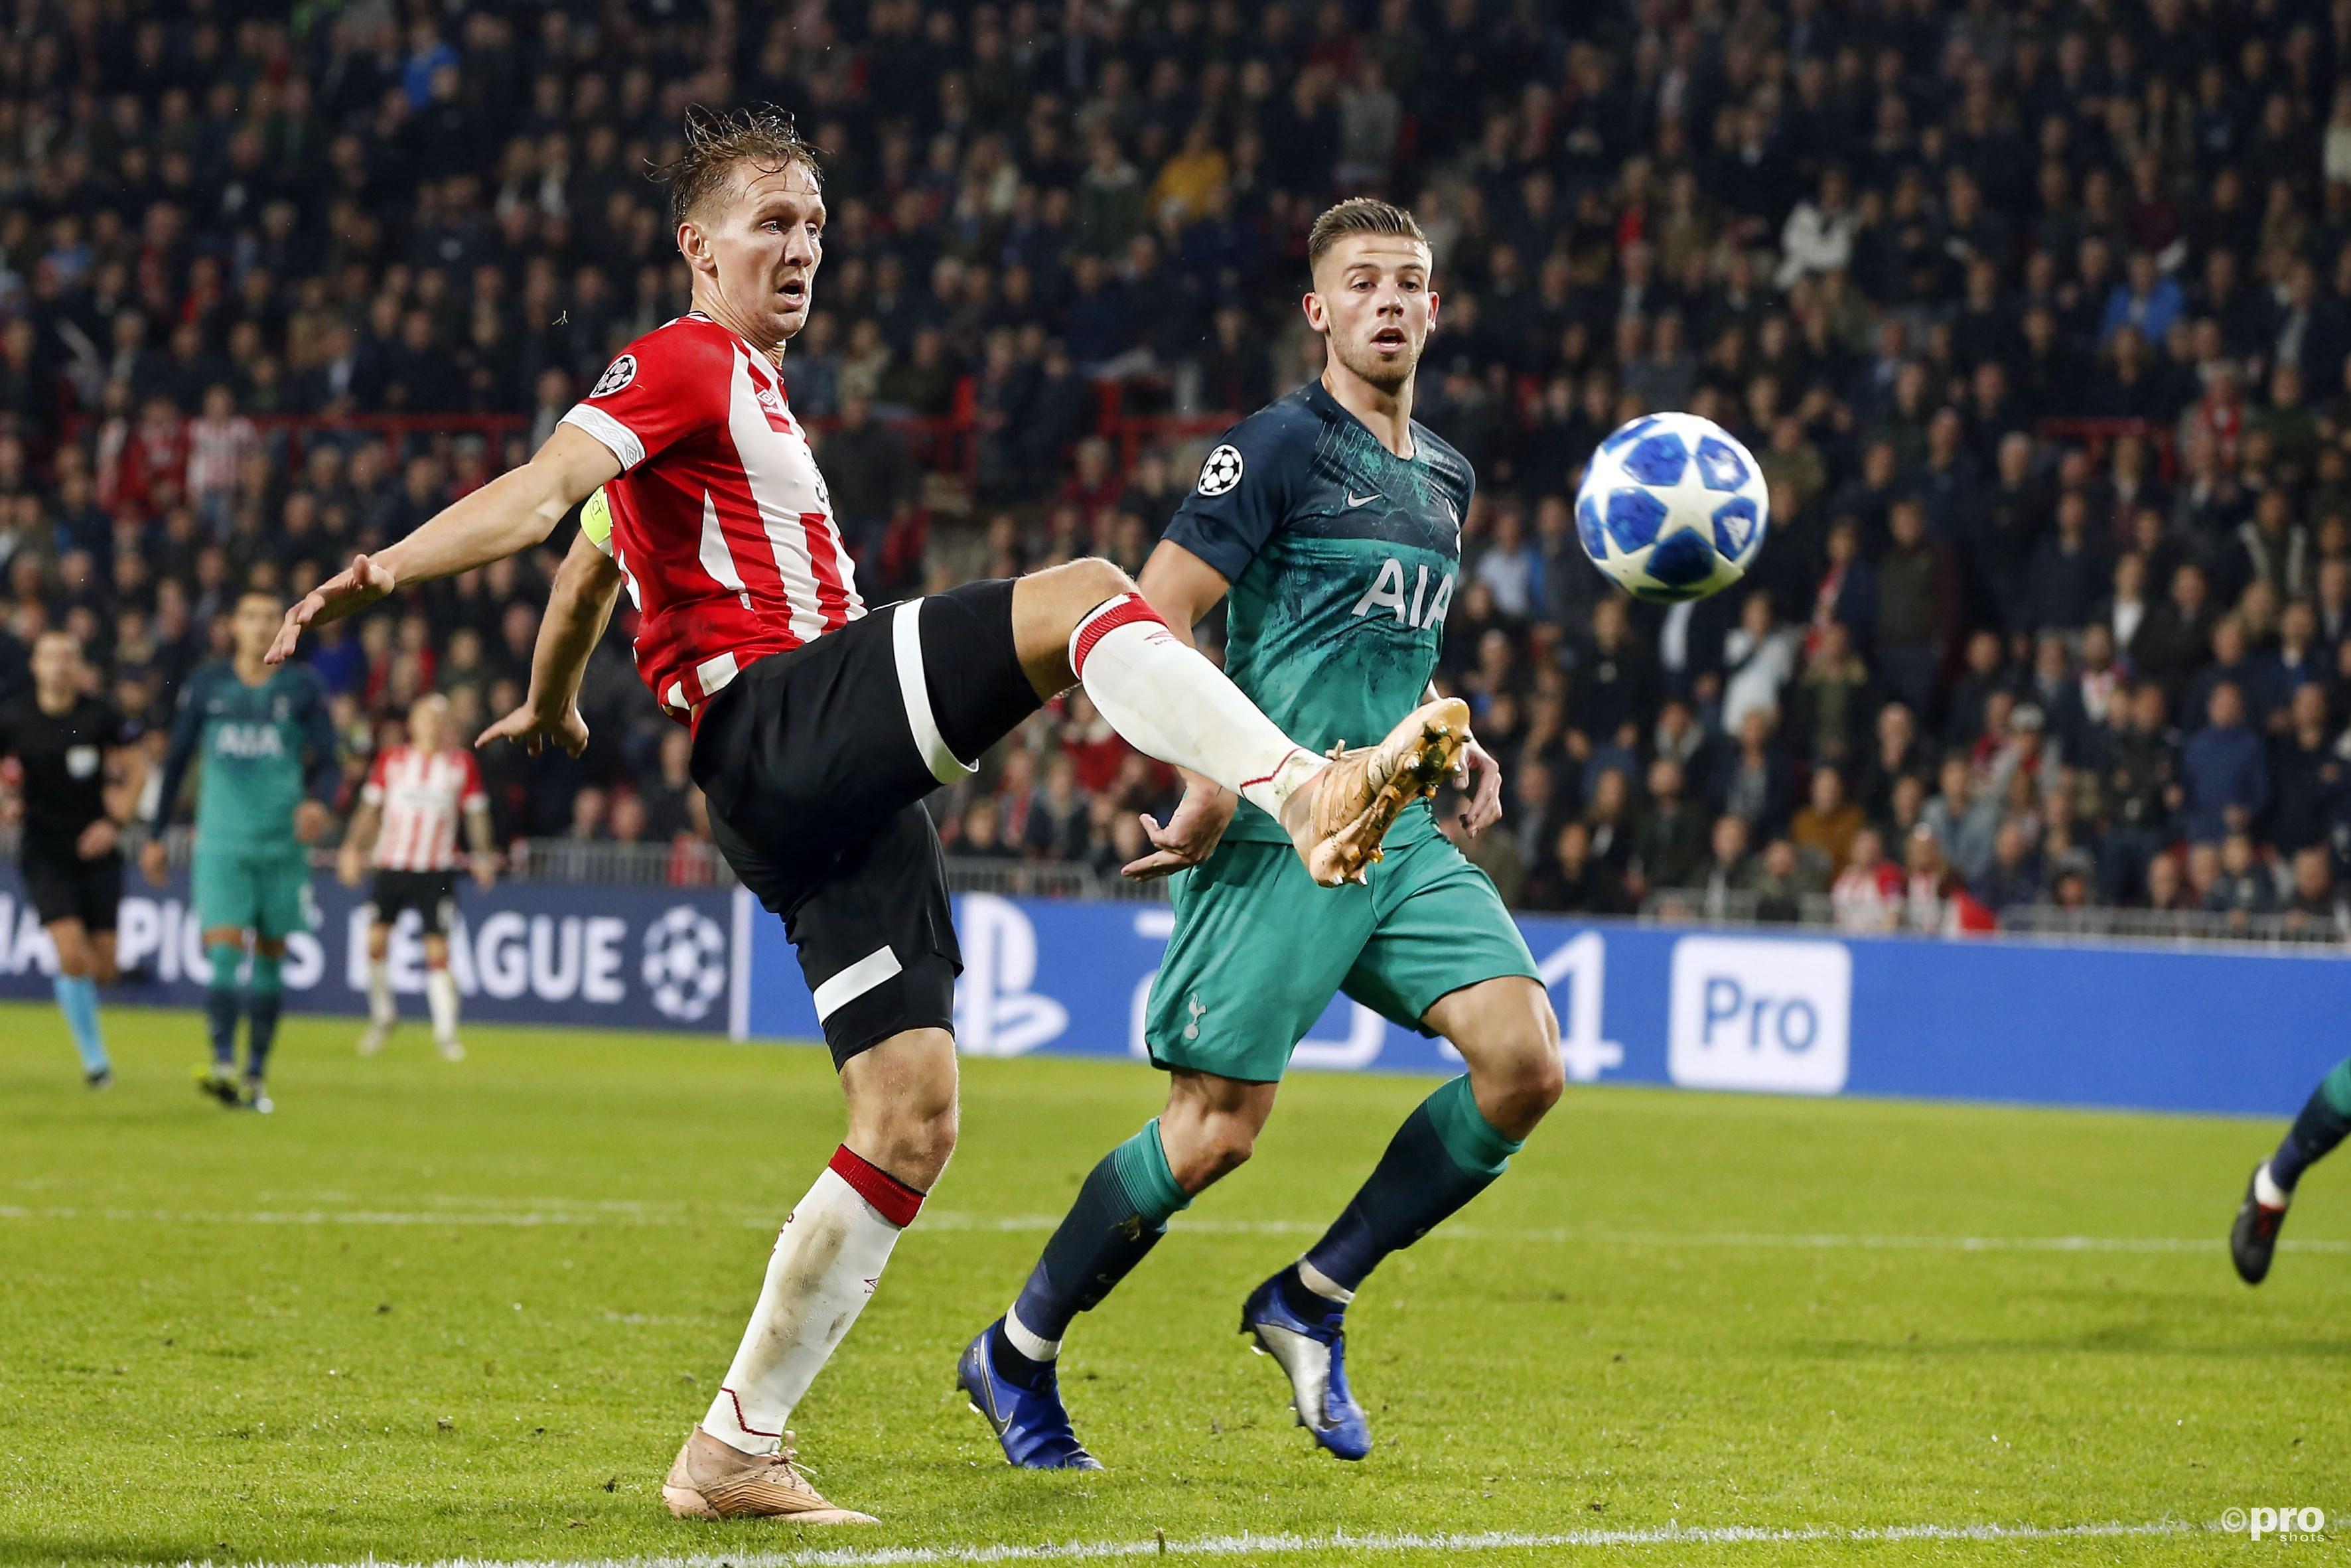 PSV - Spurs 2-2. (PRO SHOTS/Thomas Bakker)